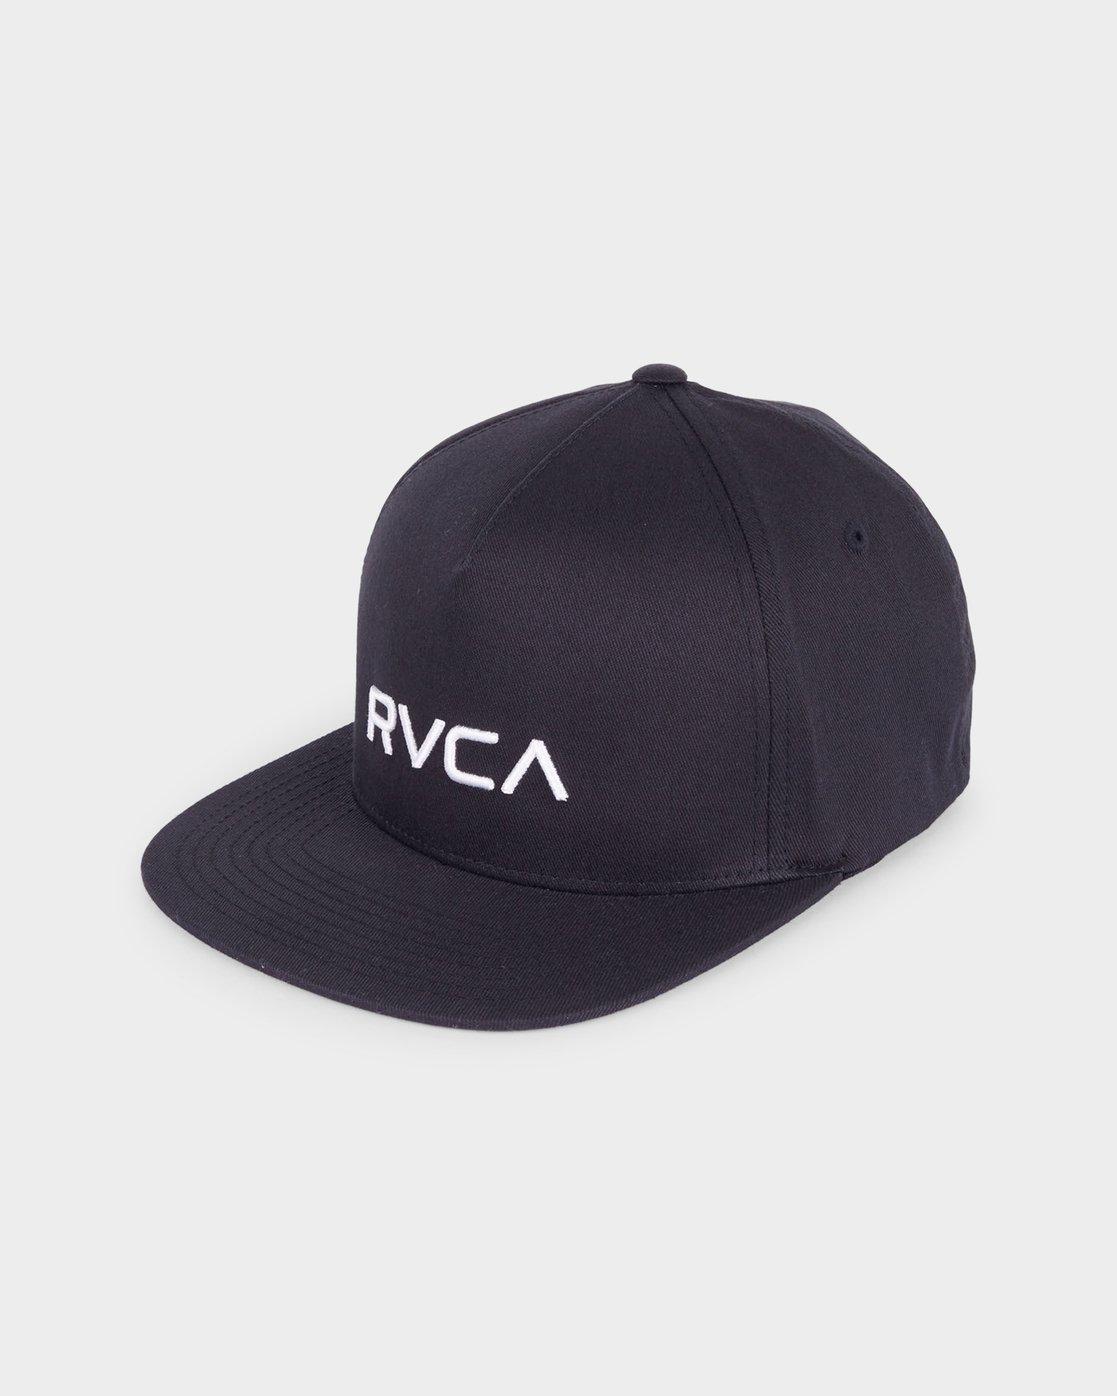 0 RVCA Sport Flexfit Cap Black R381575 RVCA